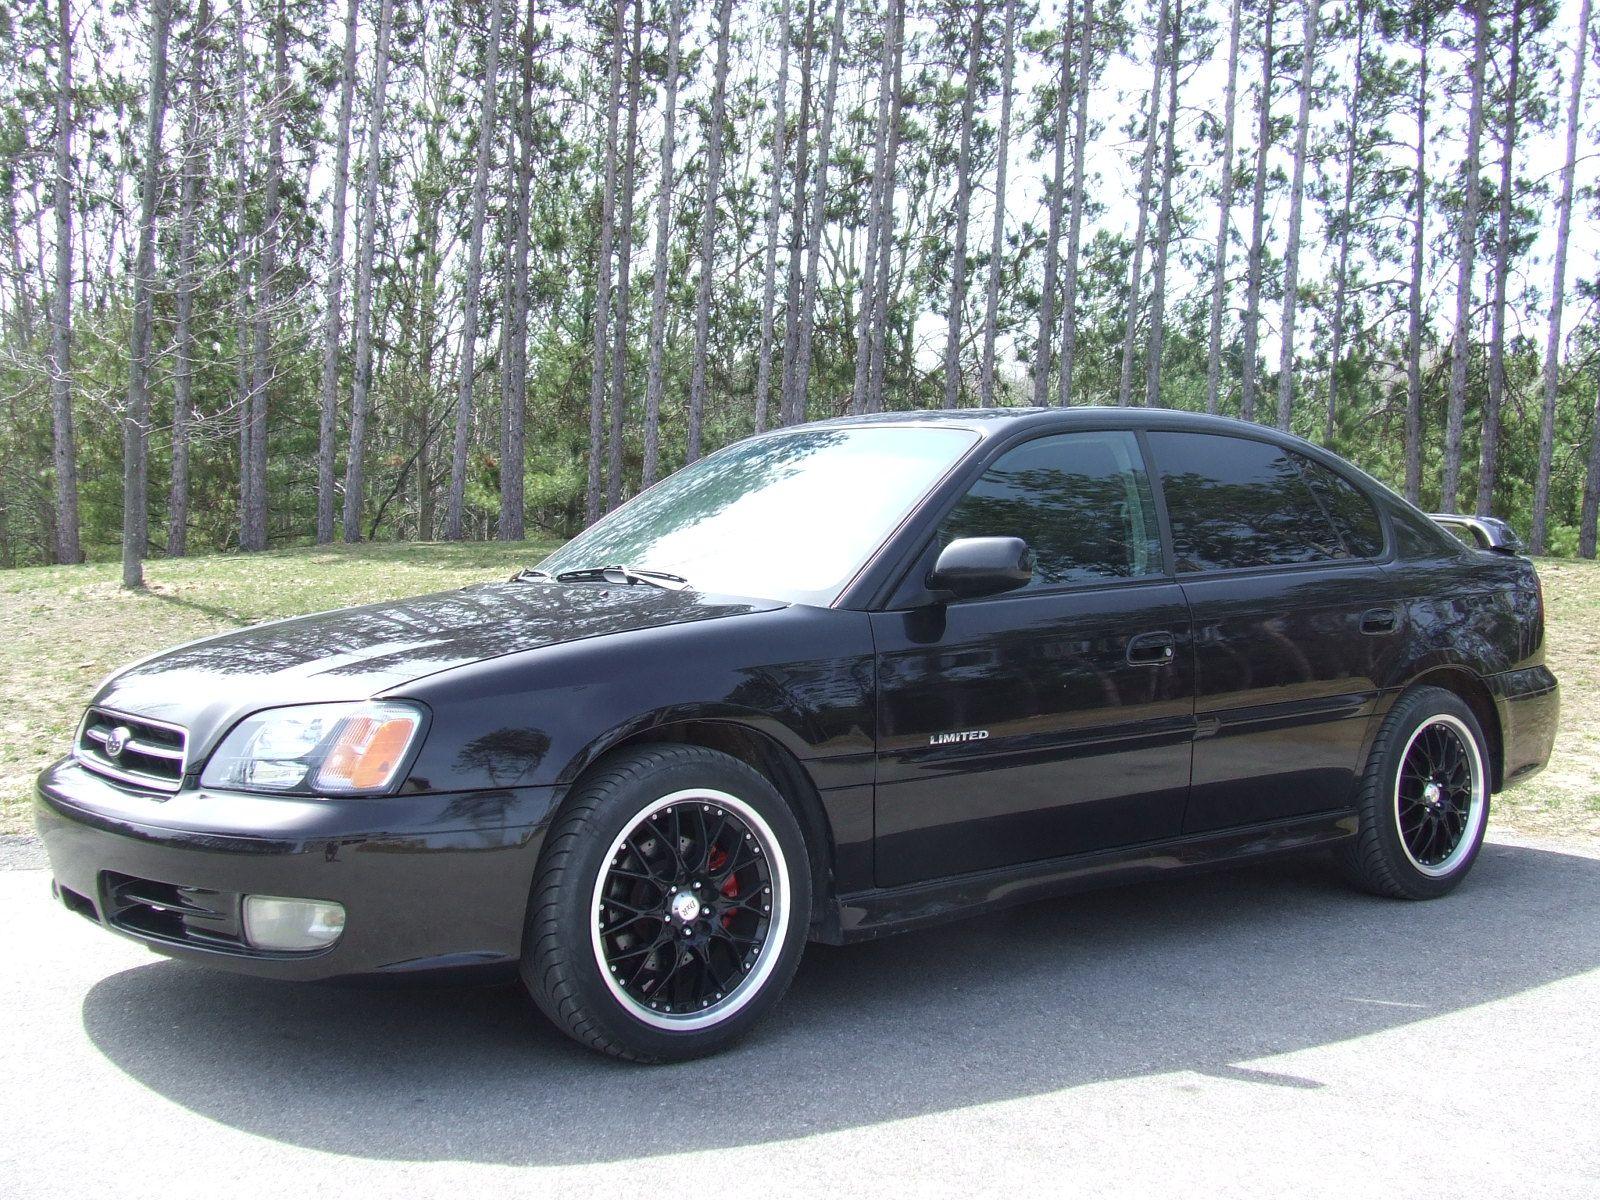 Subaru legacy supercars tuning parking silver legacy subaru cars wallpapers pinterest subaru legacy